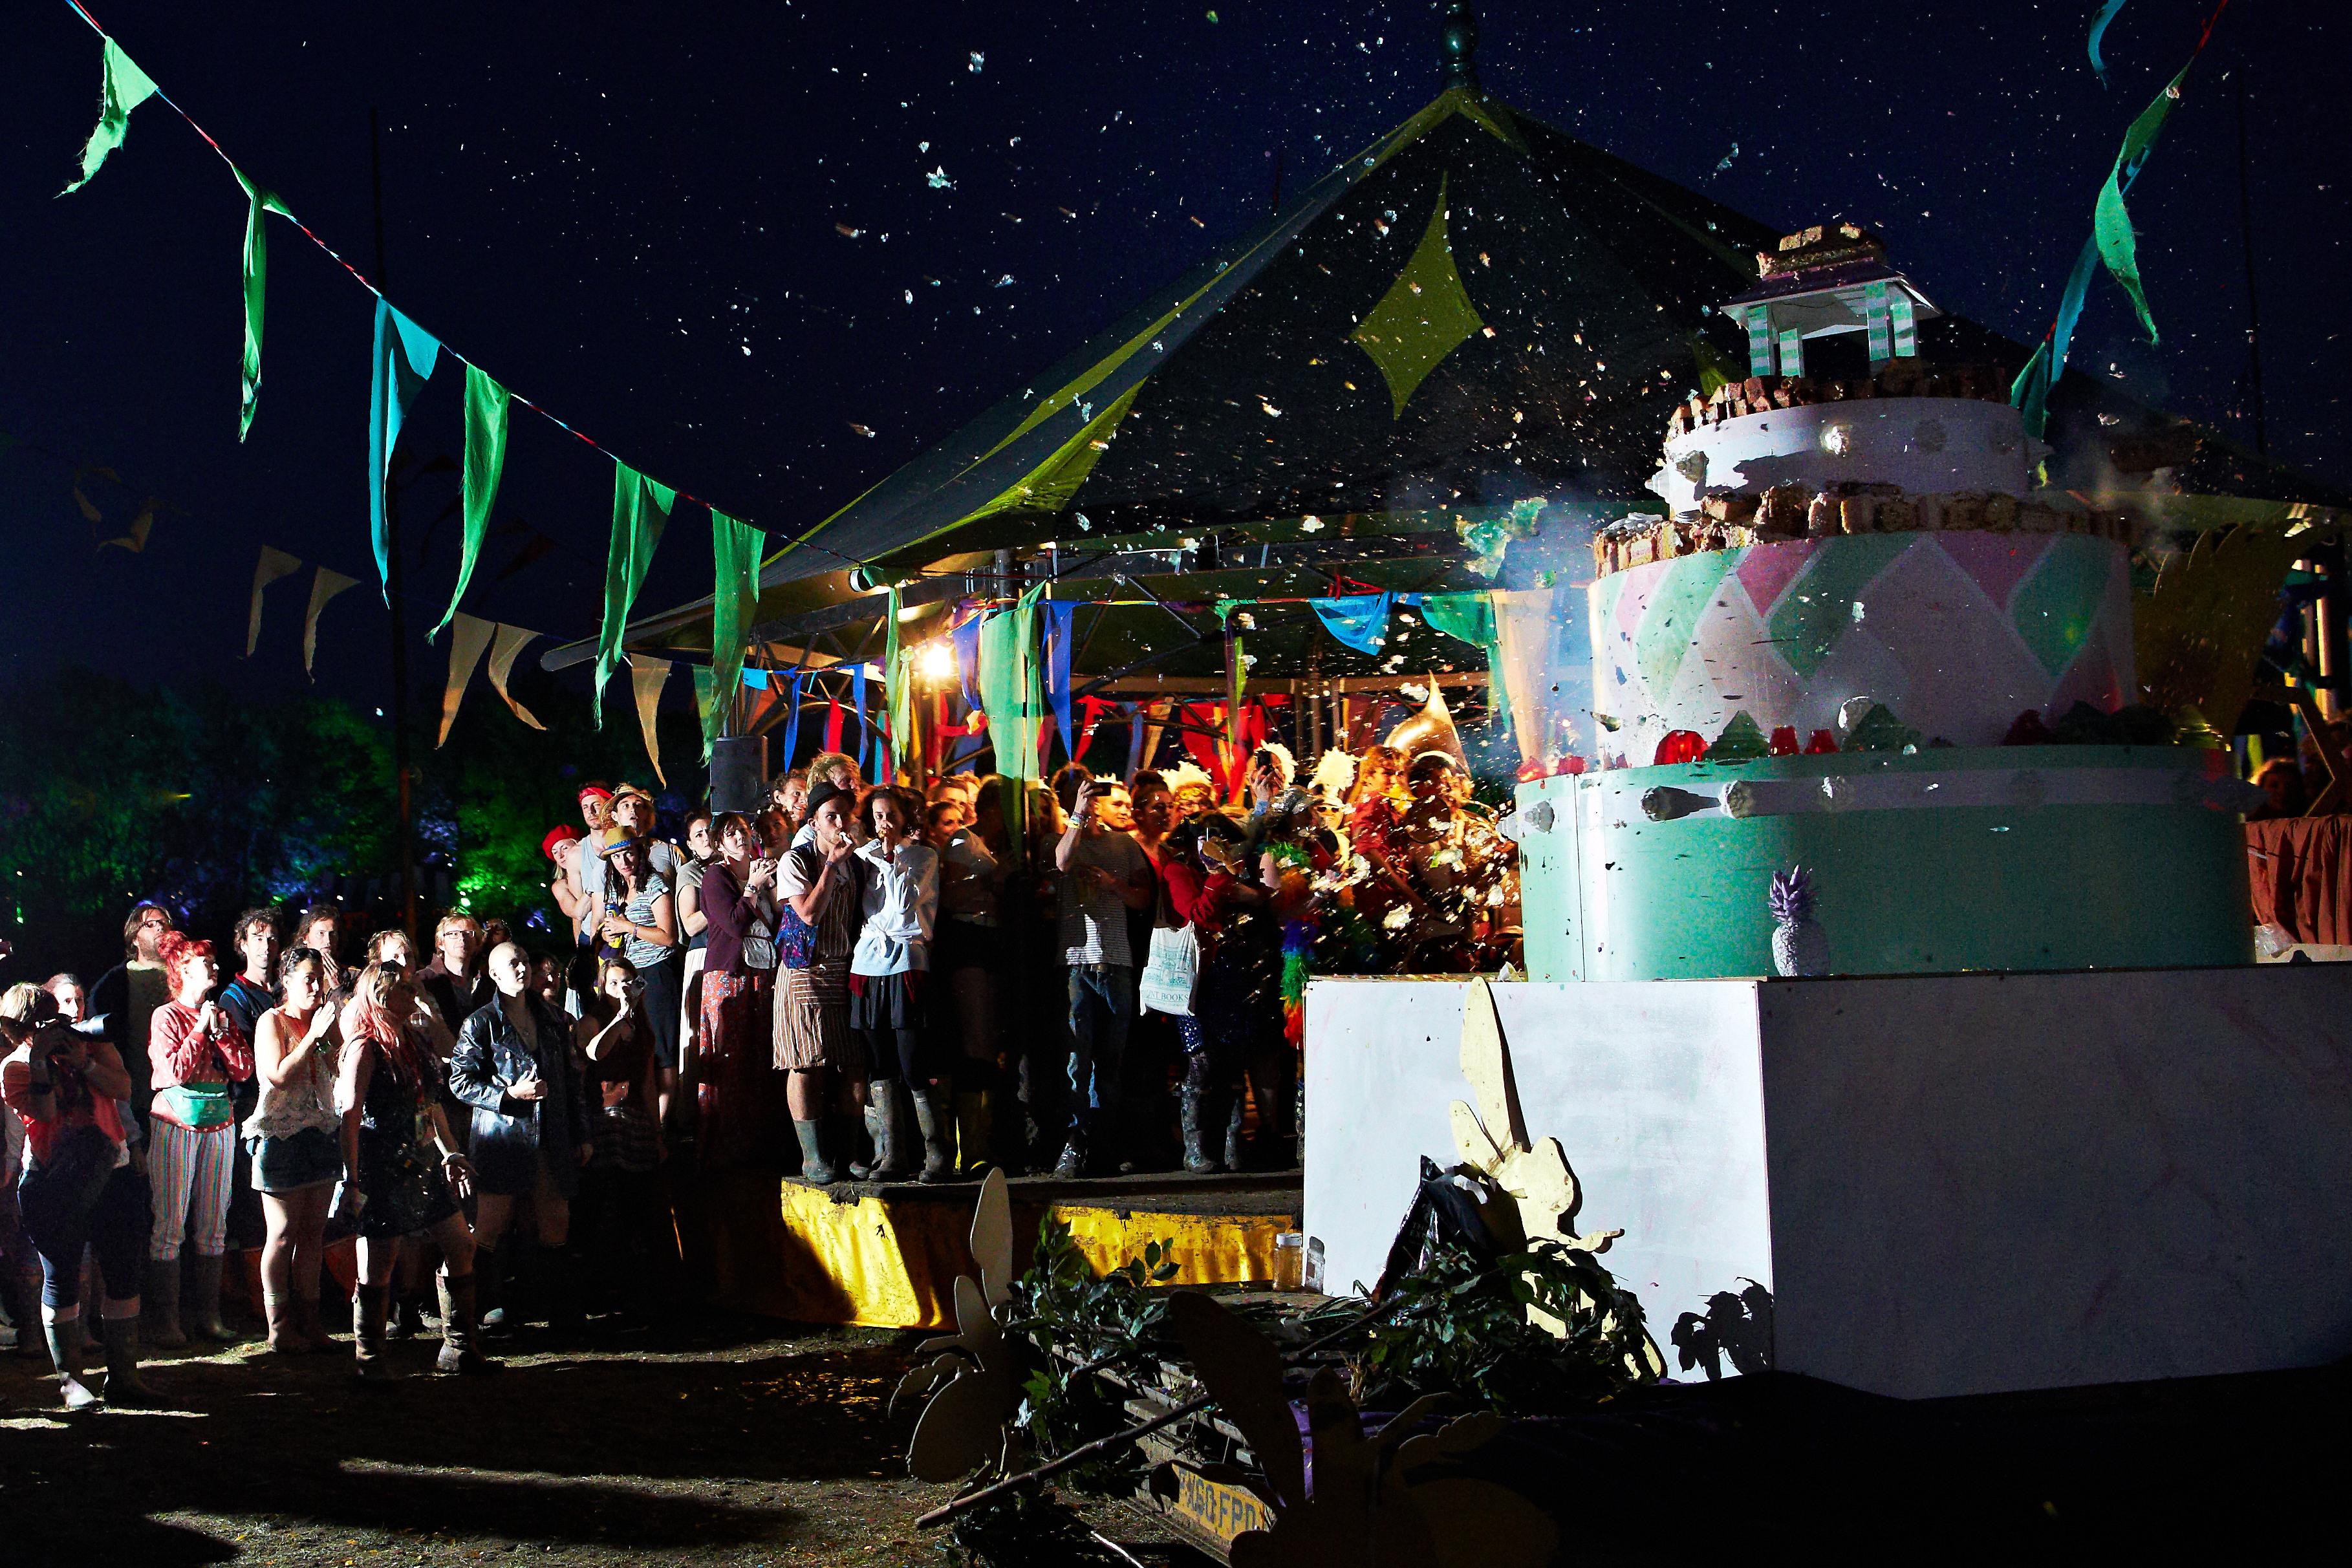 It's no secret – Secret Garden Party 2013 is primed for festival fun